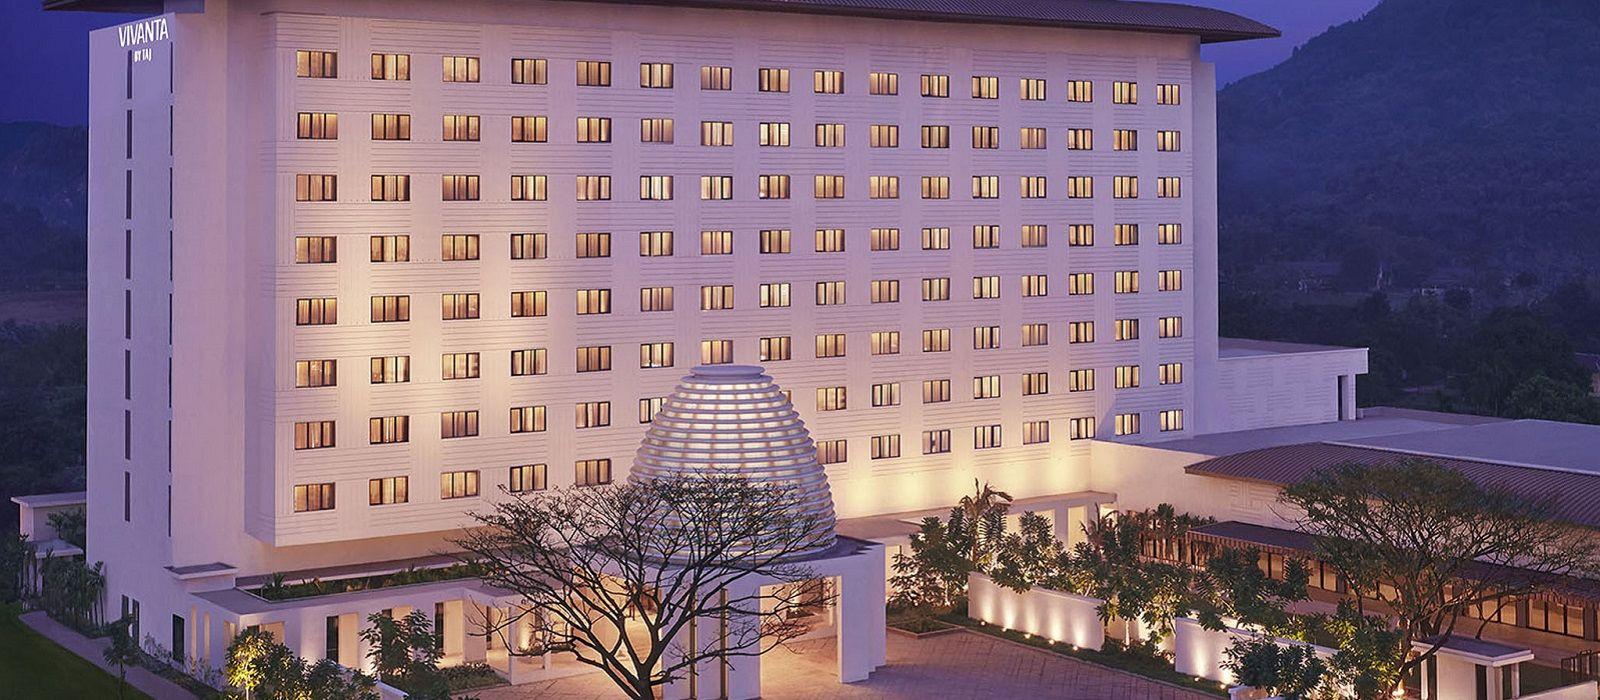 Hotel Vivanta Guwahati Ostindien